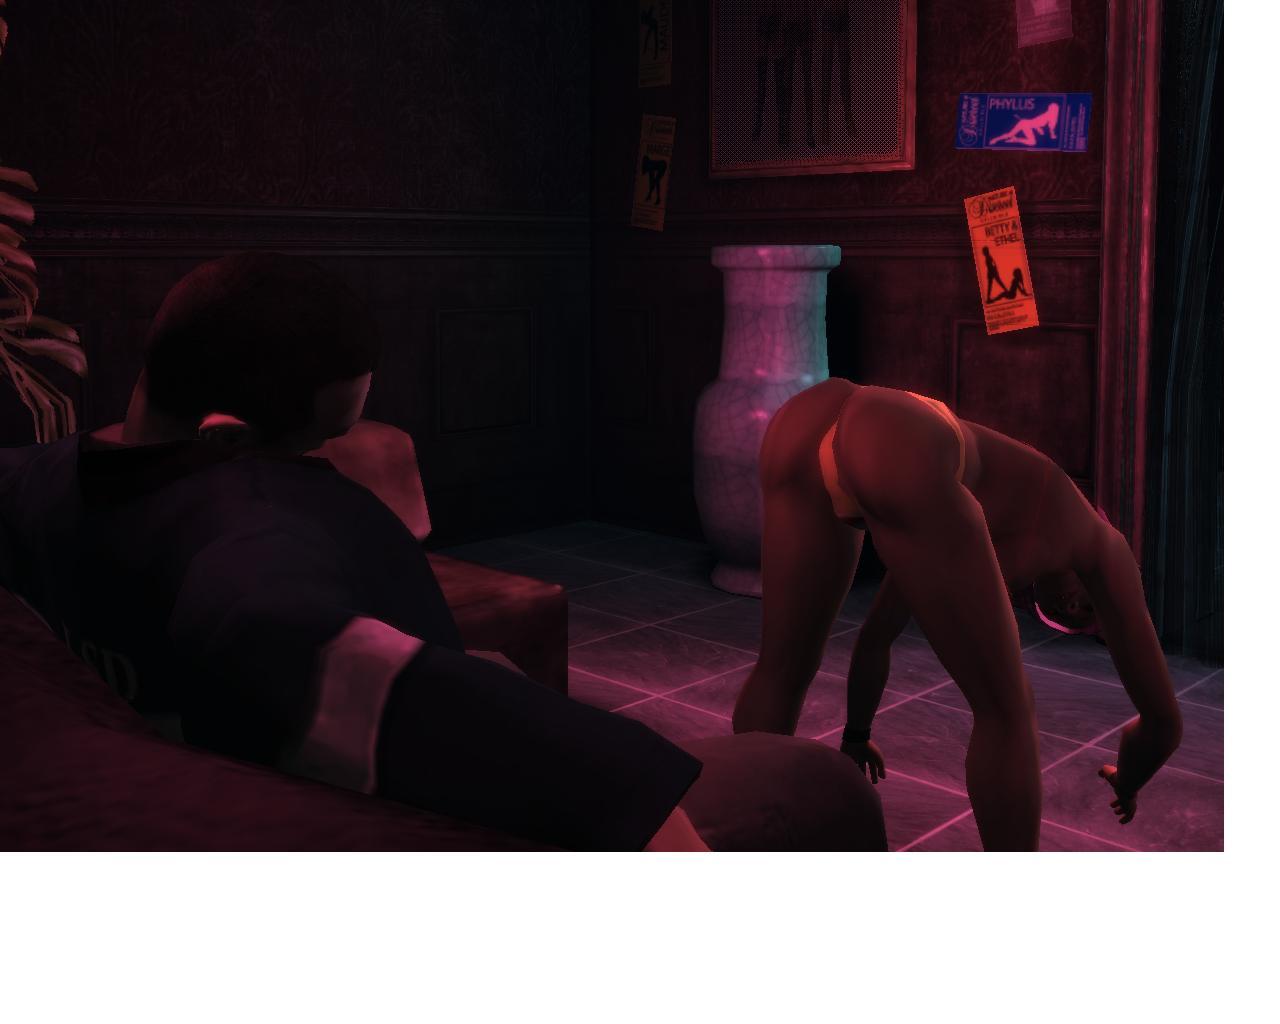 нико отдыхает - Grand Theft Auto 4 гта 4